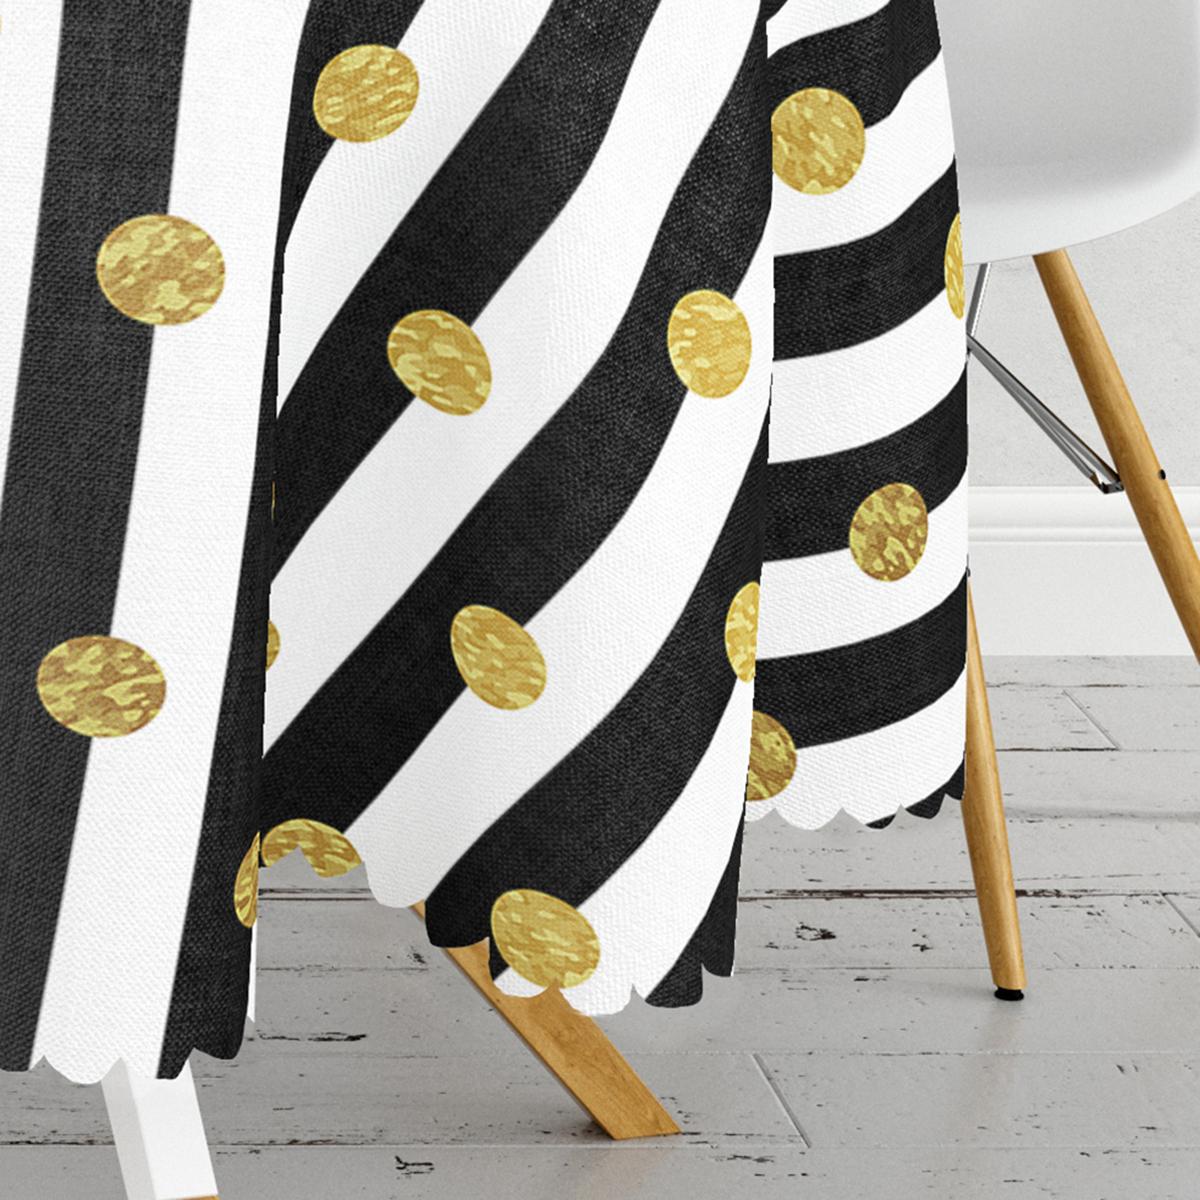 Siyah Beyaz Çizgili Gold Puantiyeli Dijital Baskılı Yuvarlak Masa Örtüsü - Çap 140cm Realhomes